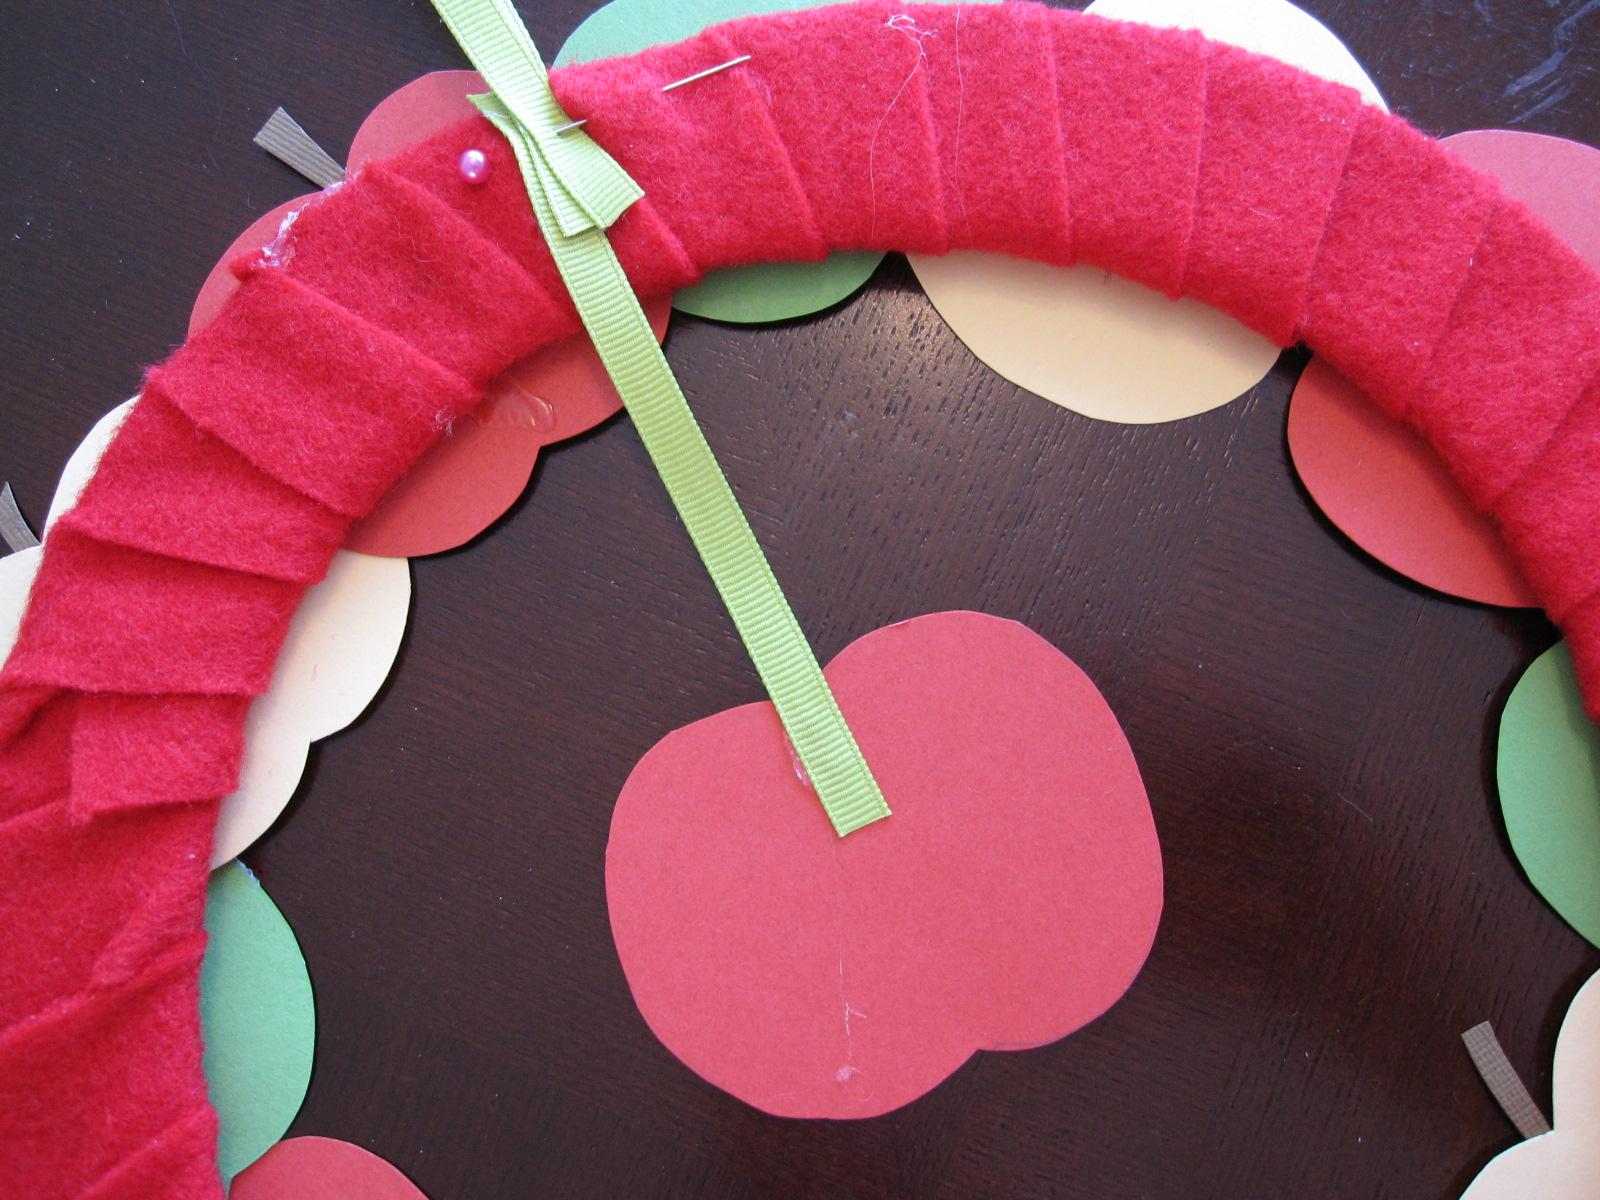 Can You Use Elmers Glue On Felt Crafts